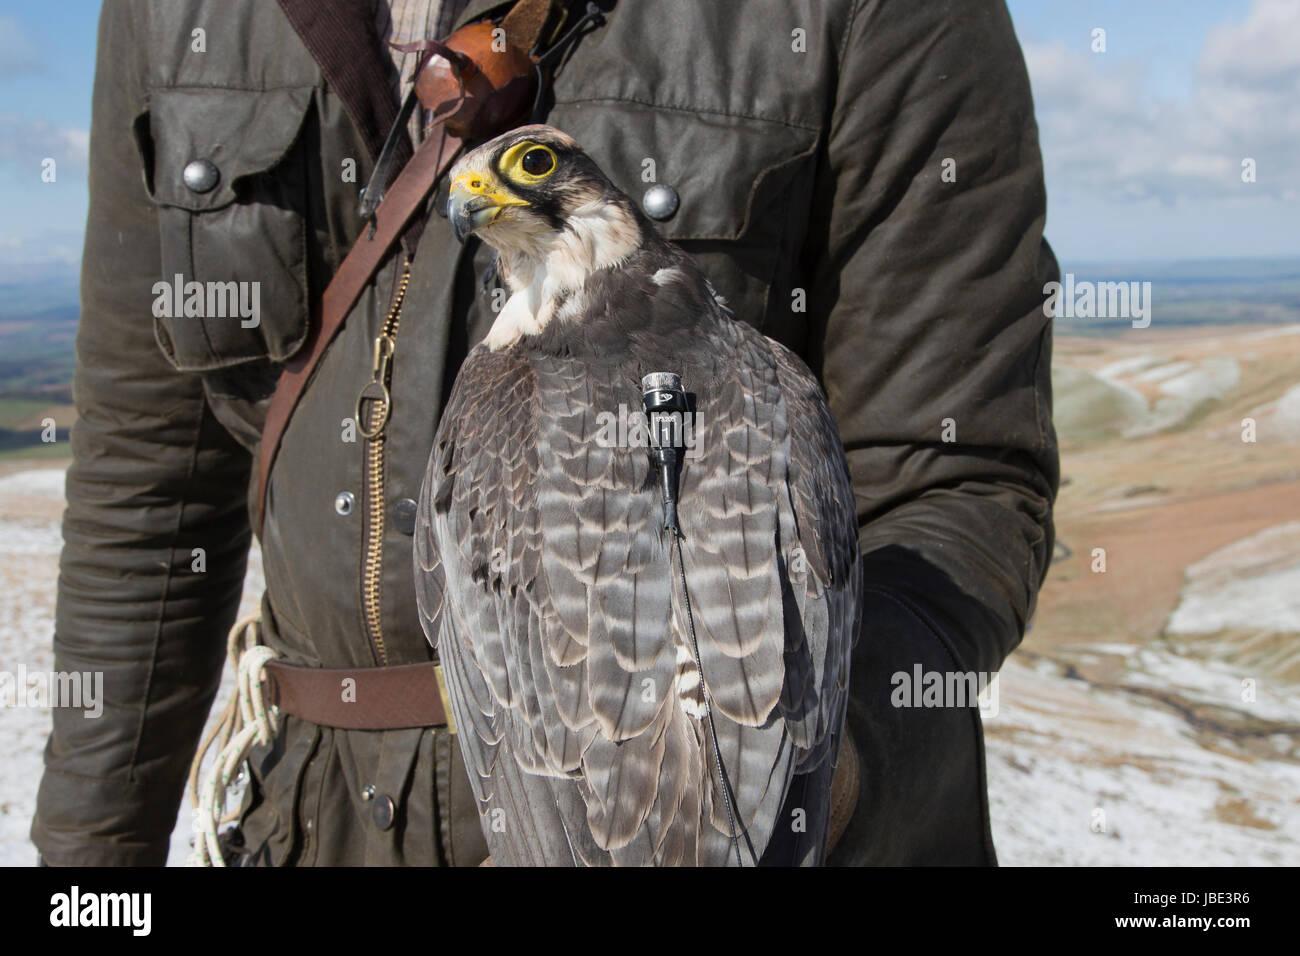 Lanner Falke (Falco Biarmicus) mit Sender, unverlierbare Falknerei Vogel, Cumbria, UK, April 2016 Stockbild